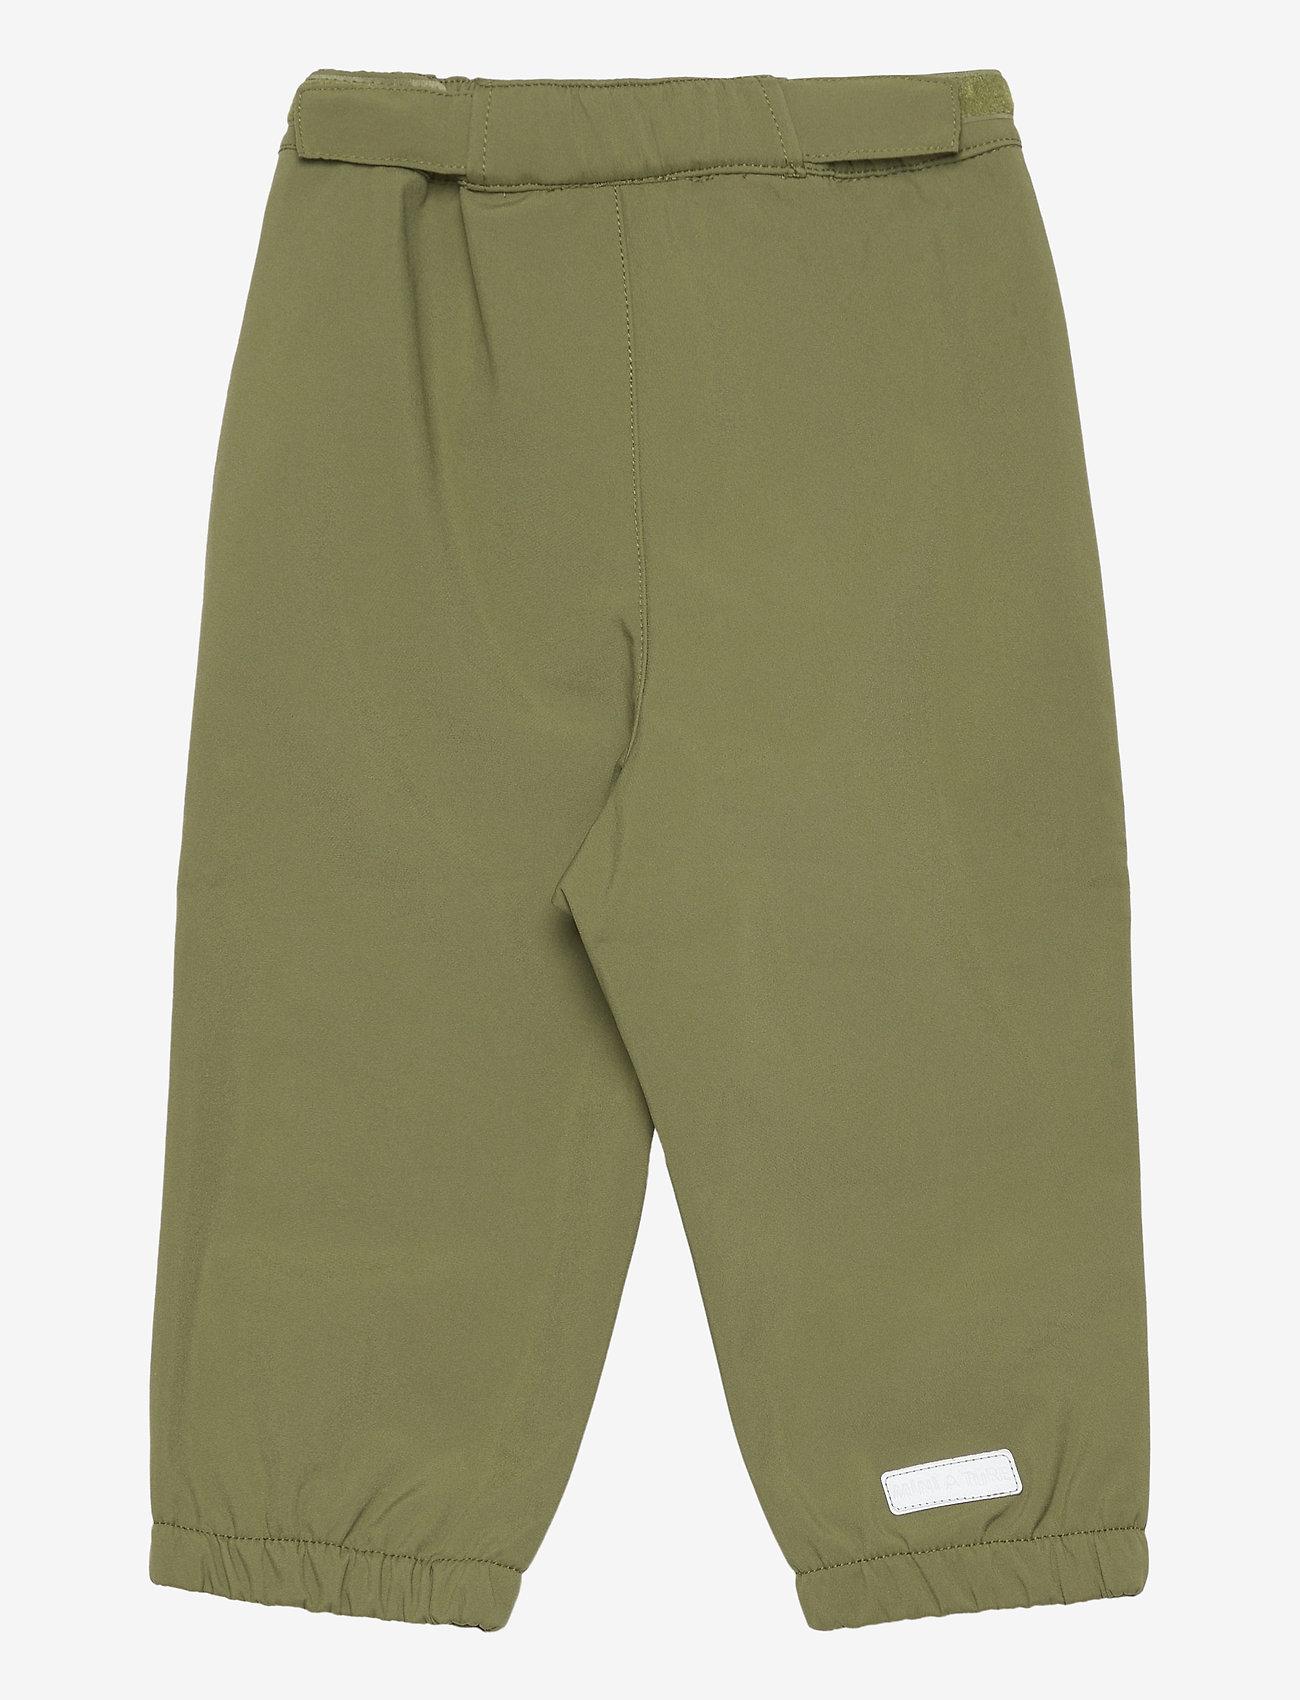 Mini A Ture - Aian Pants, M - bovenkleding - olivine green - 1